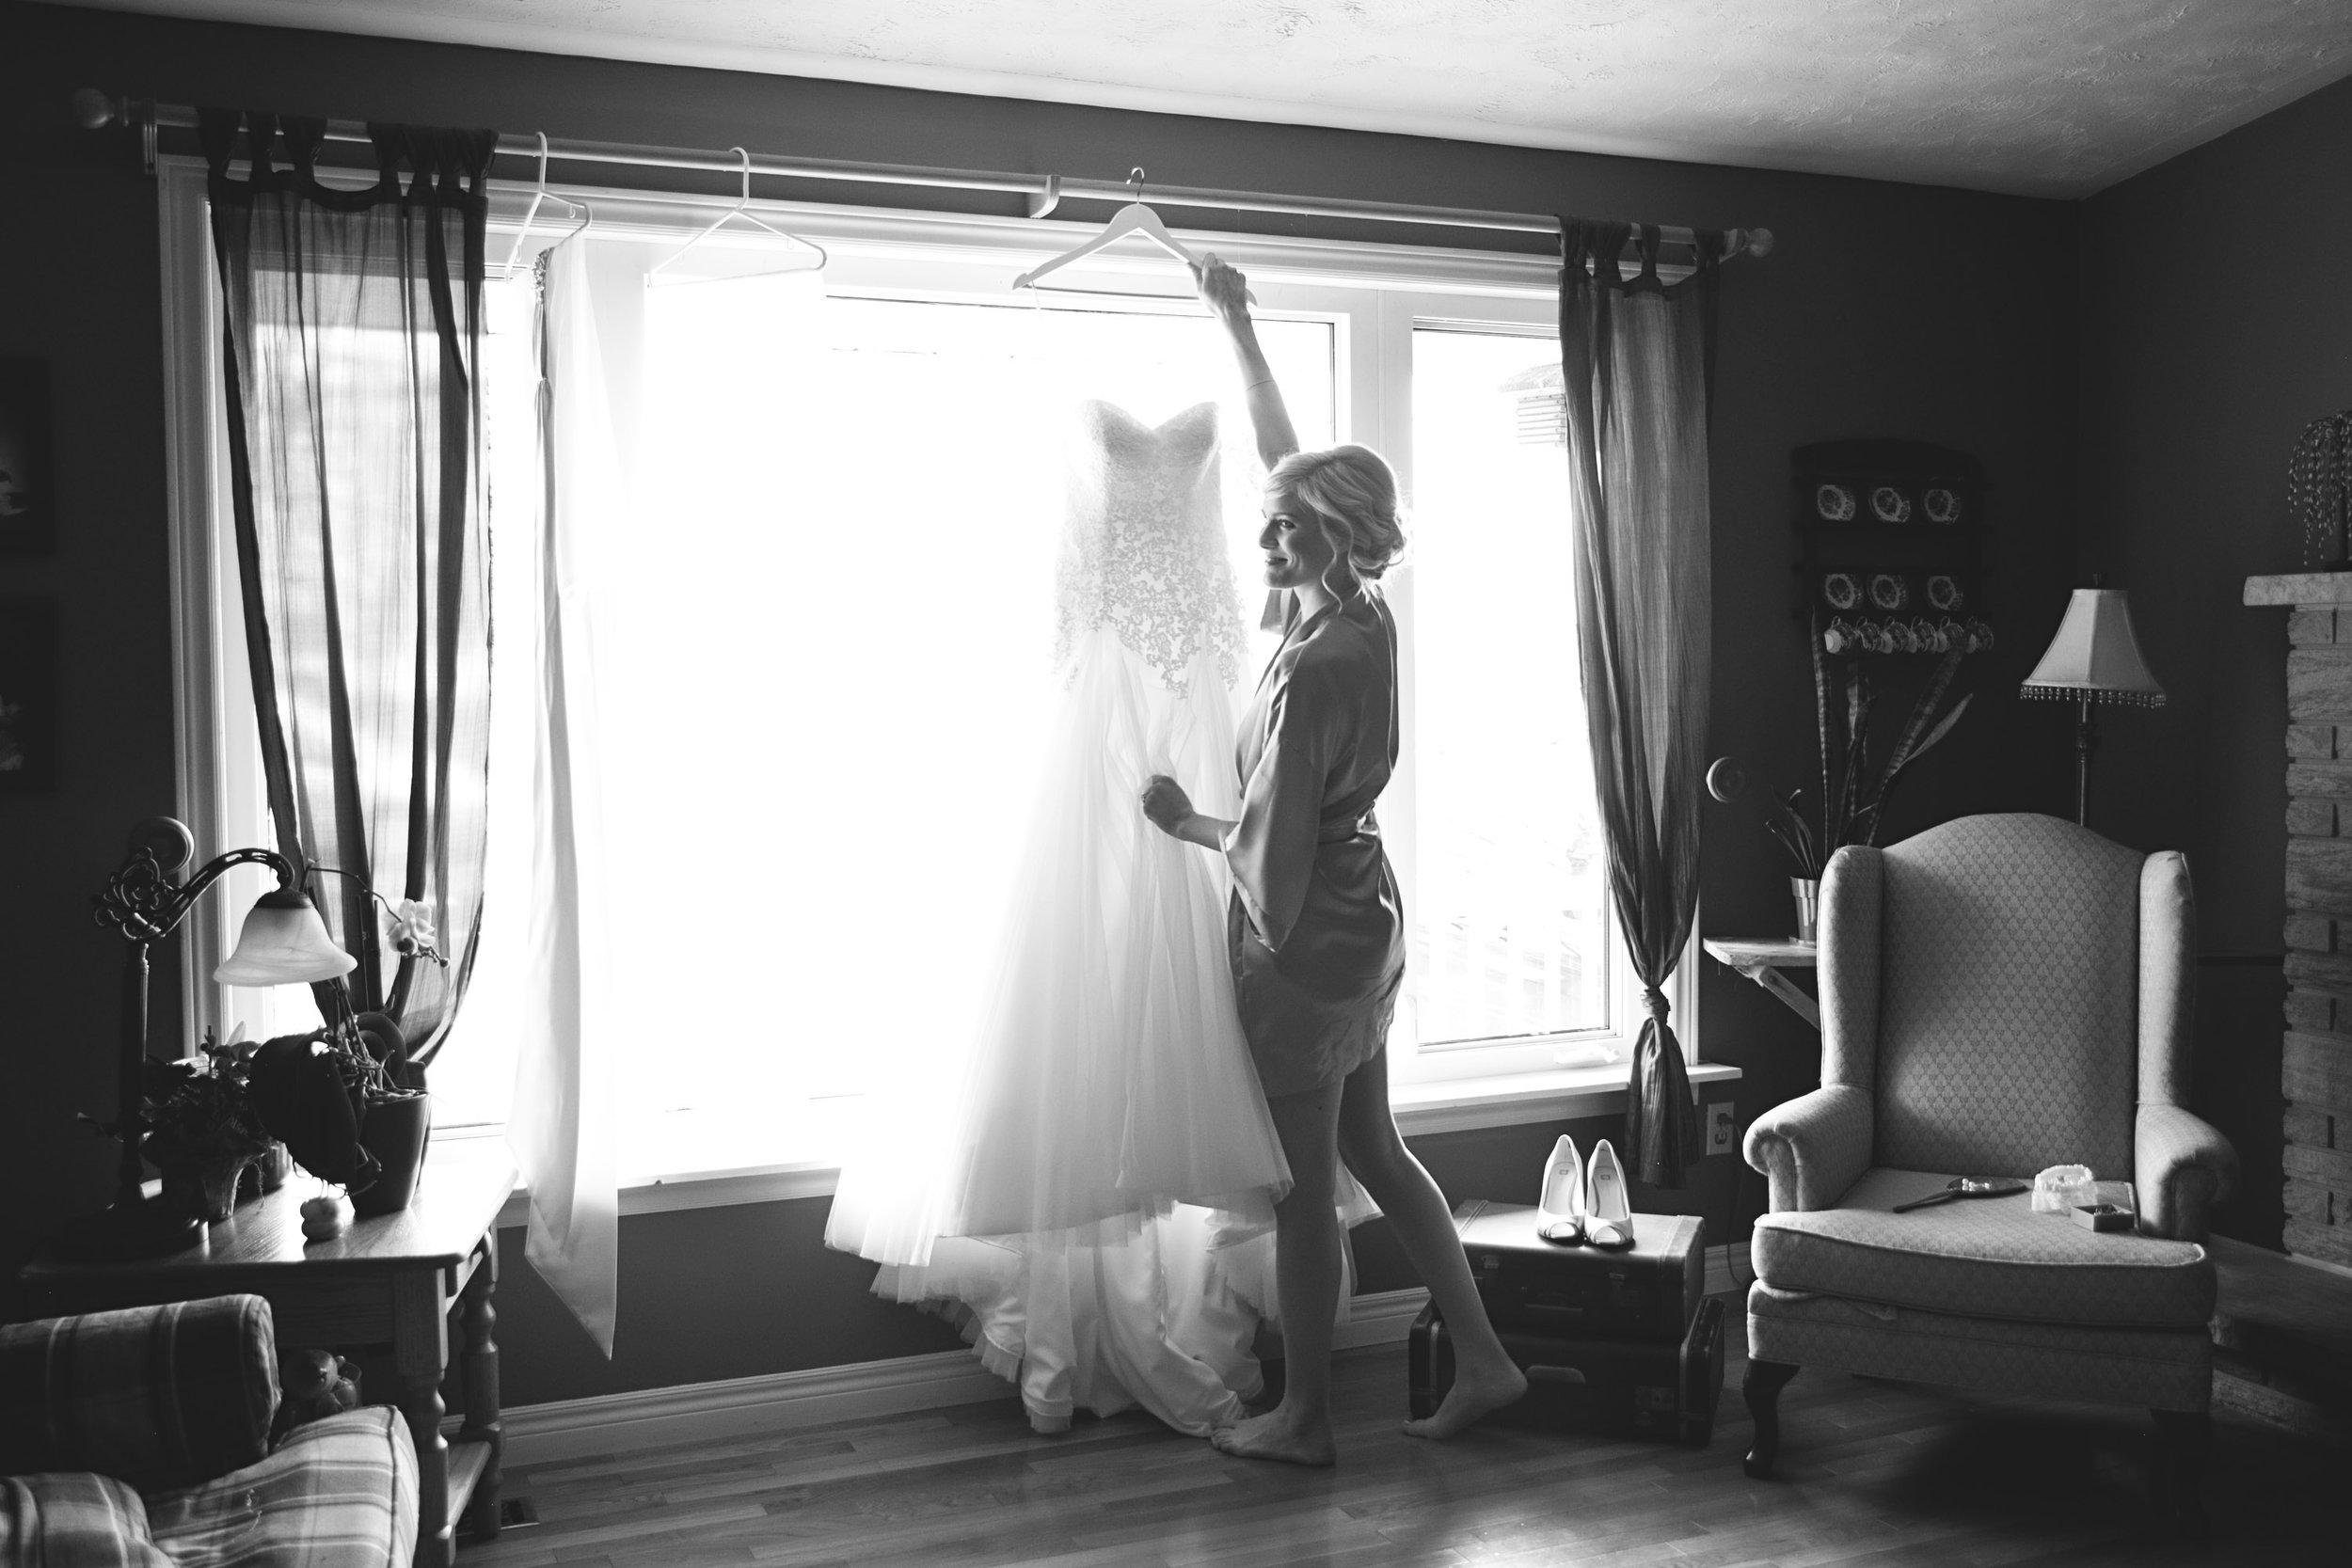 Bride putting wedding dress on